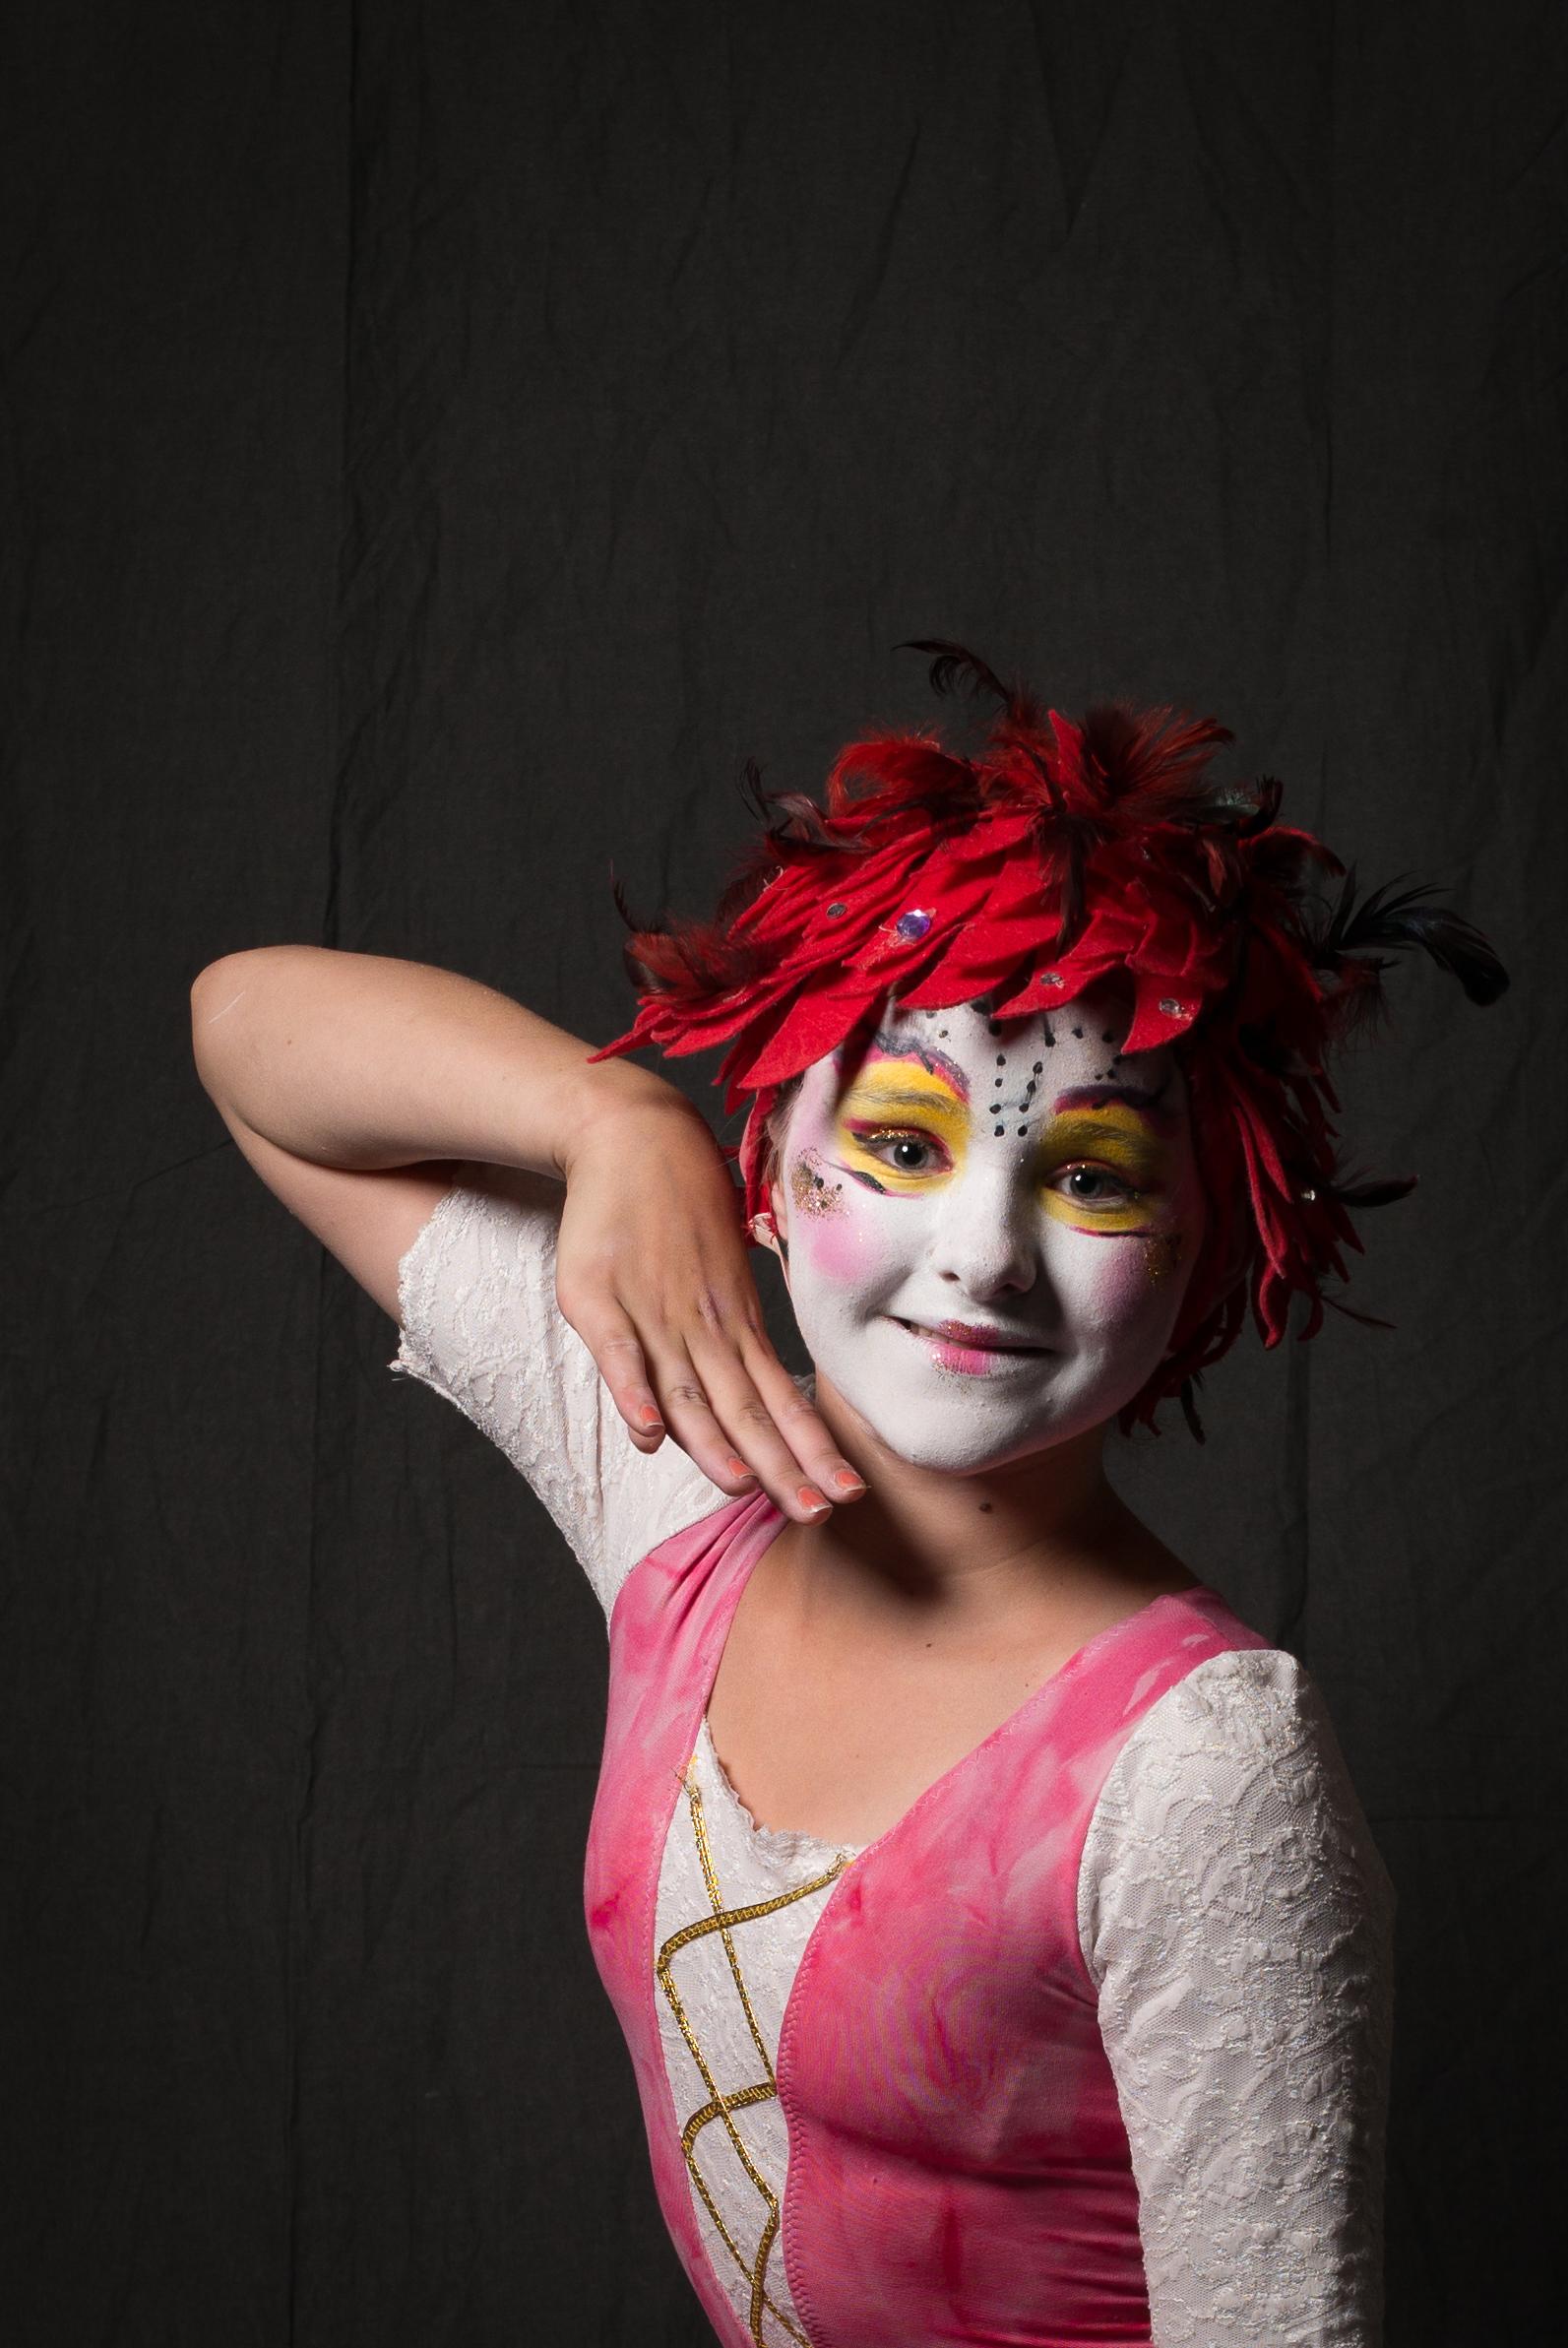 2015_Apr_2015-4-Le_Petit_Cirque_117.jpg